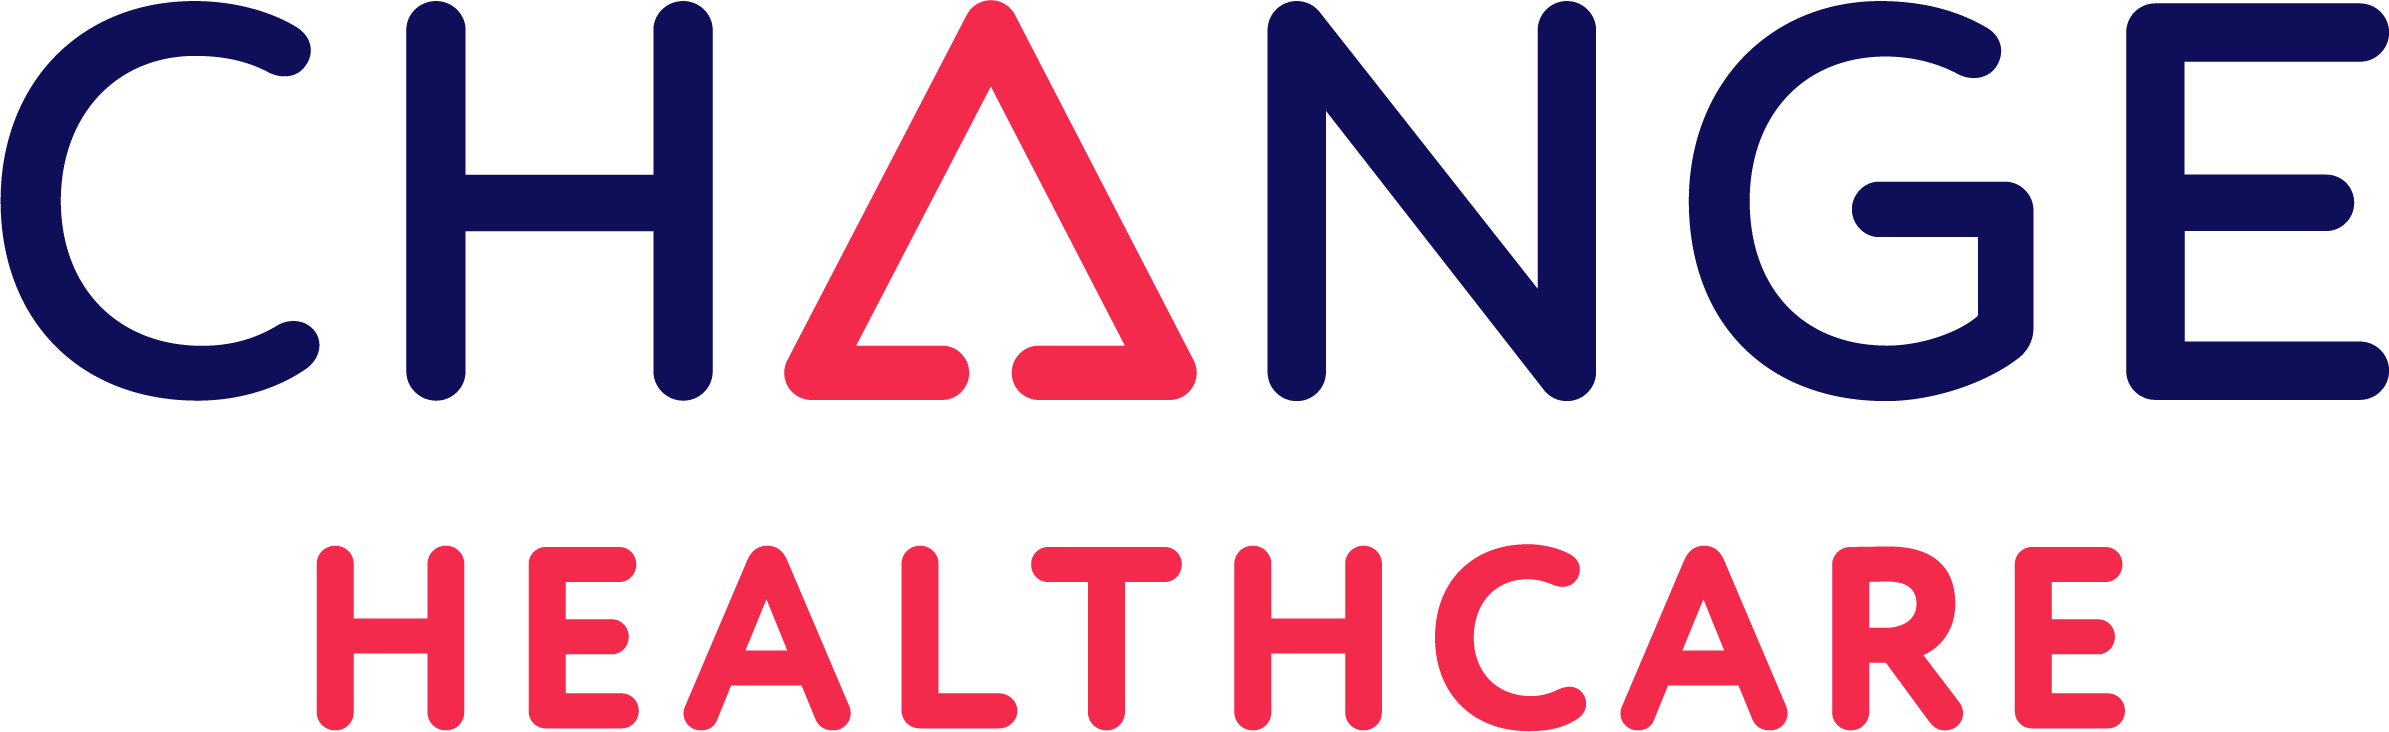 CH_red_blue_logo